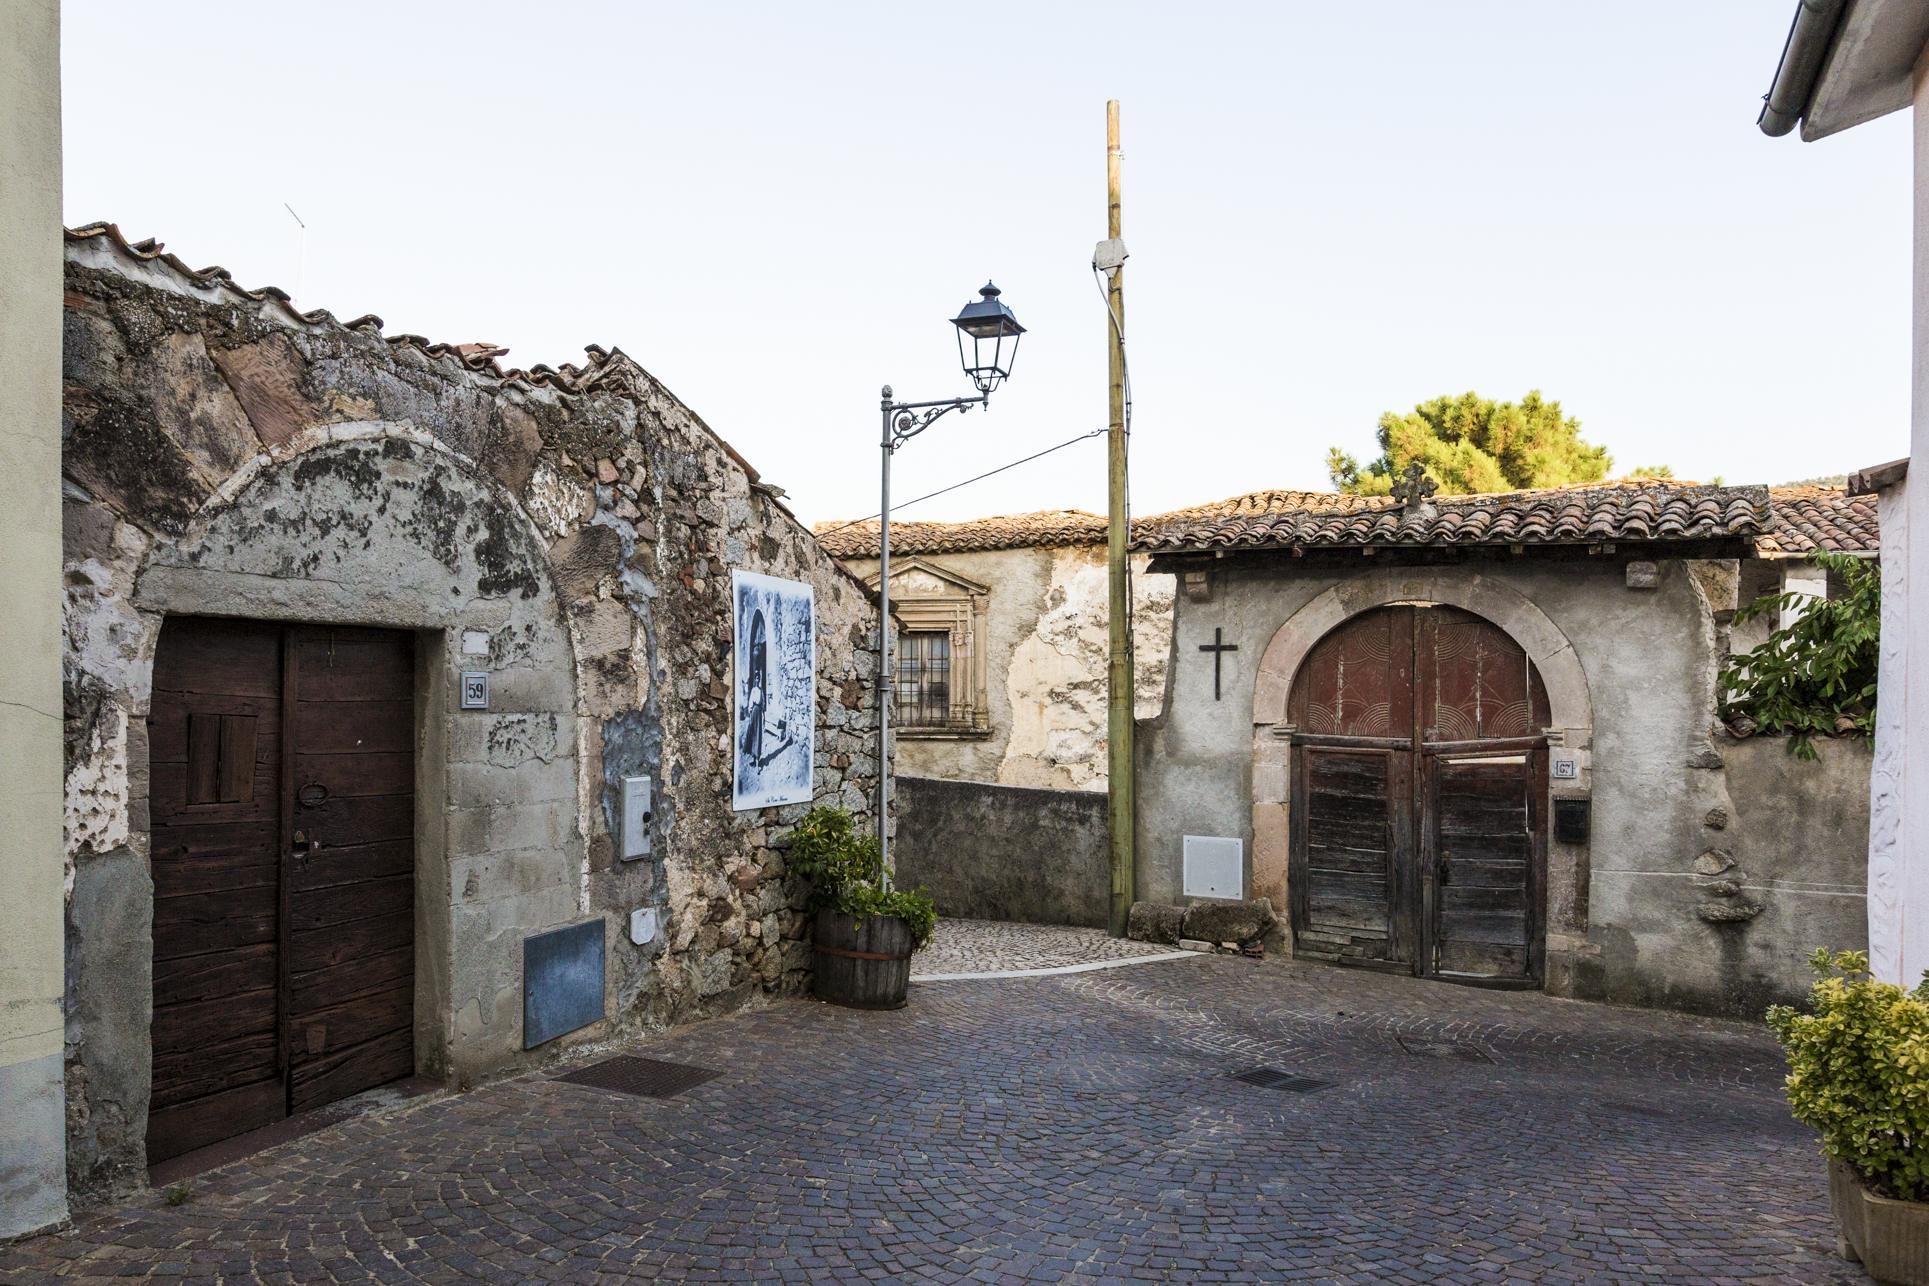 Atzara, scorcio del centro storico - Fonte www.sardegnaturismo.it